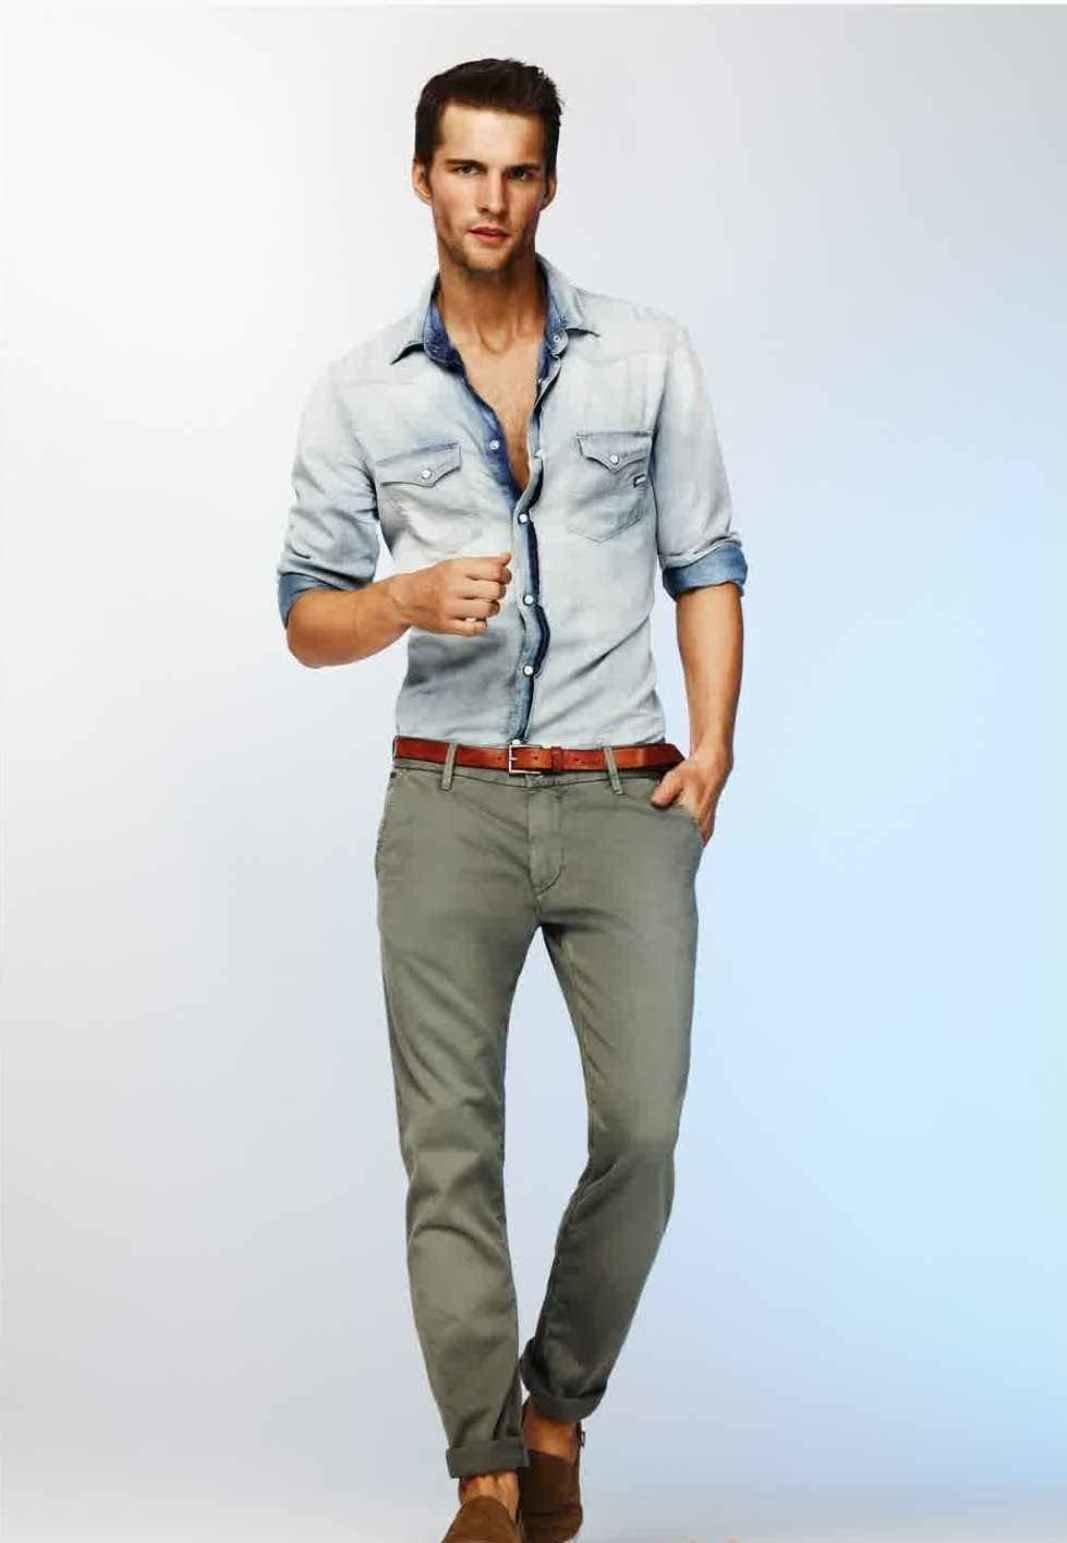 men's casual clothing - HD1067×1543